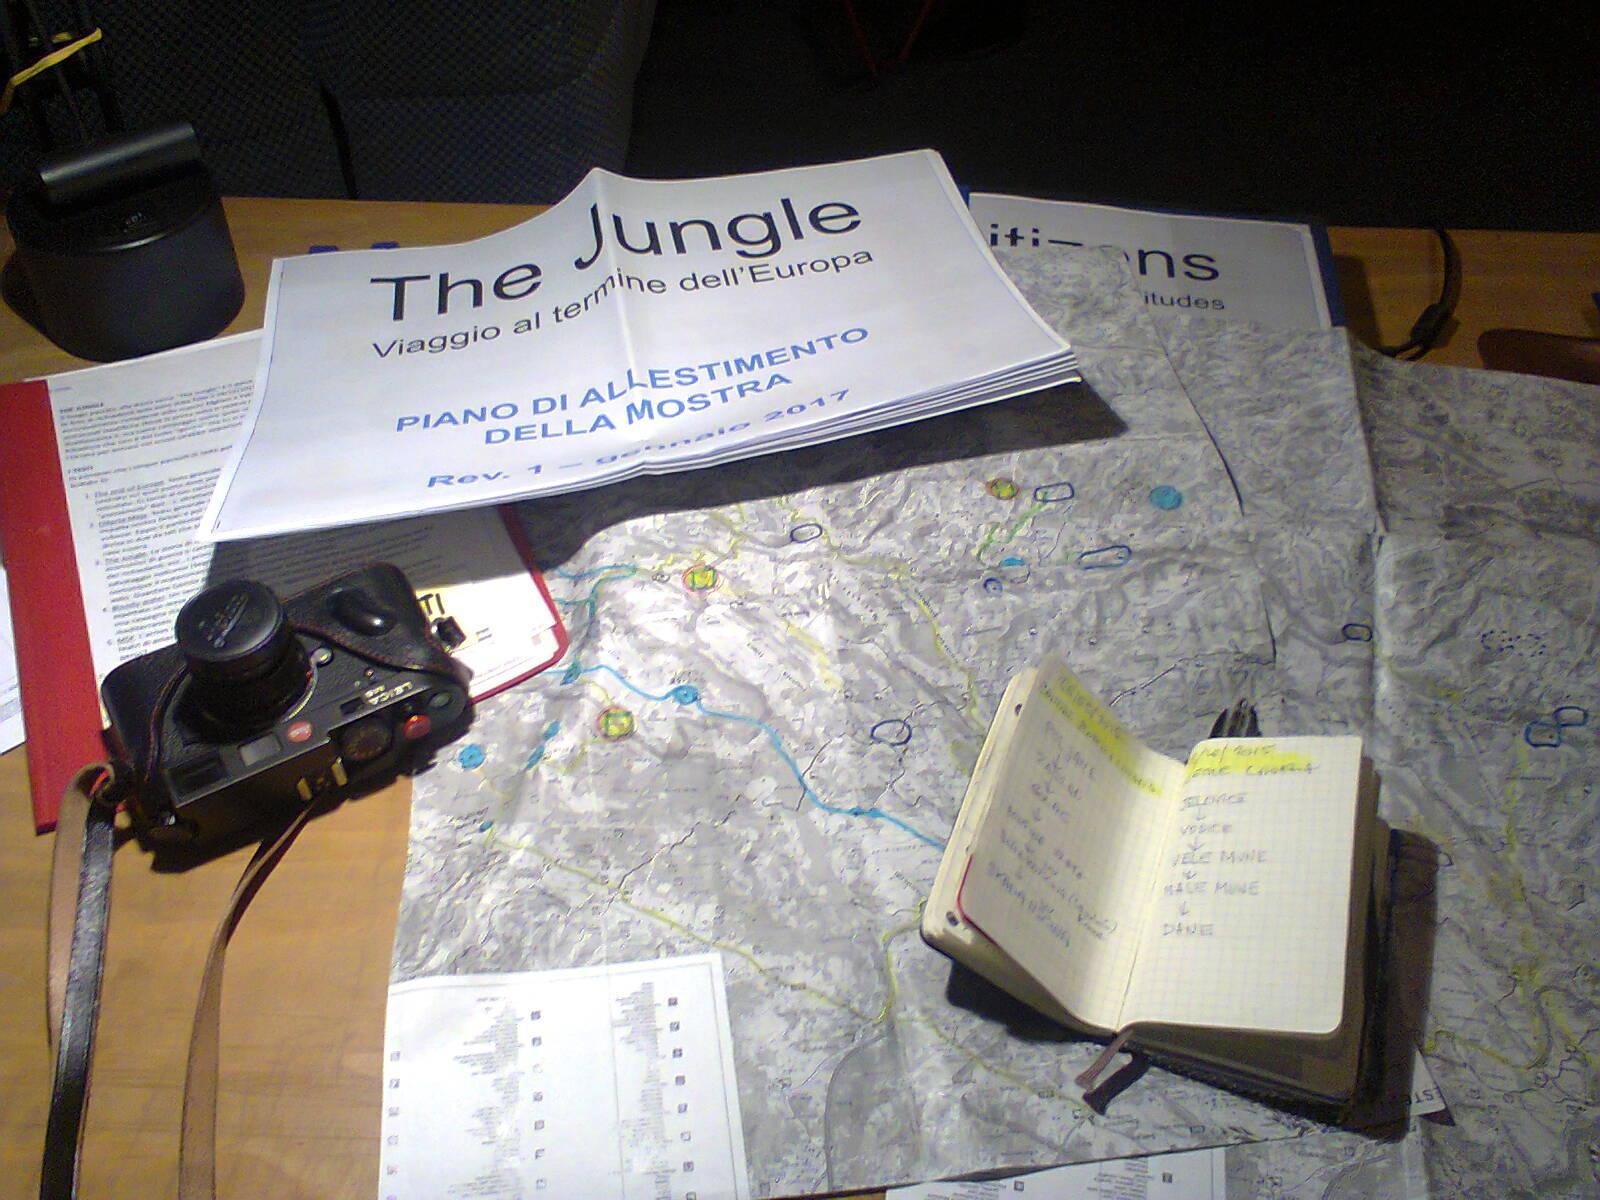 mostra the jungle